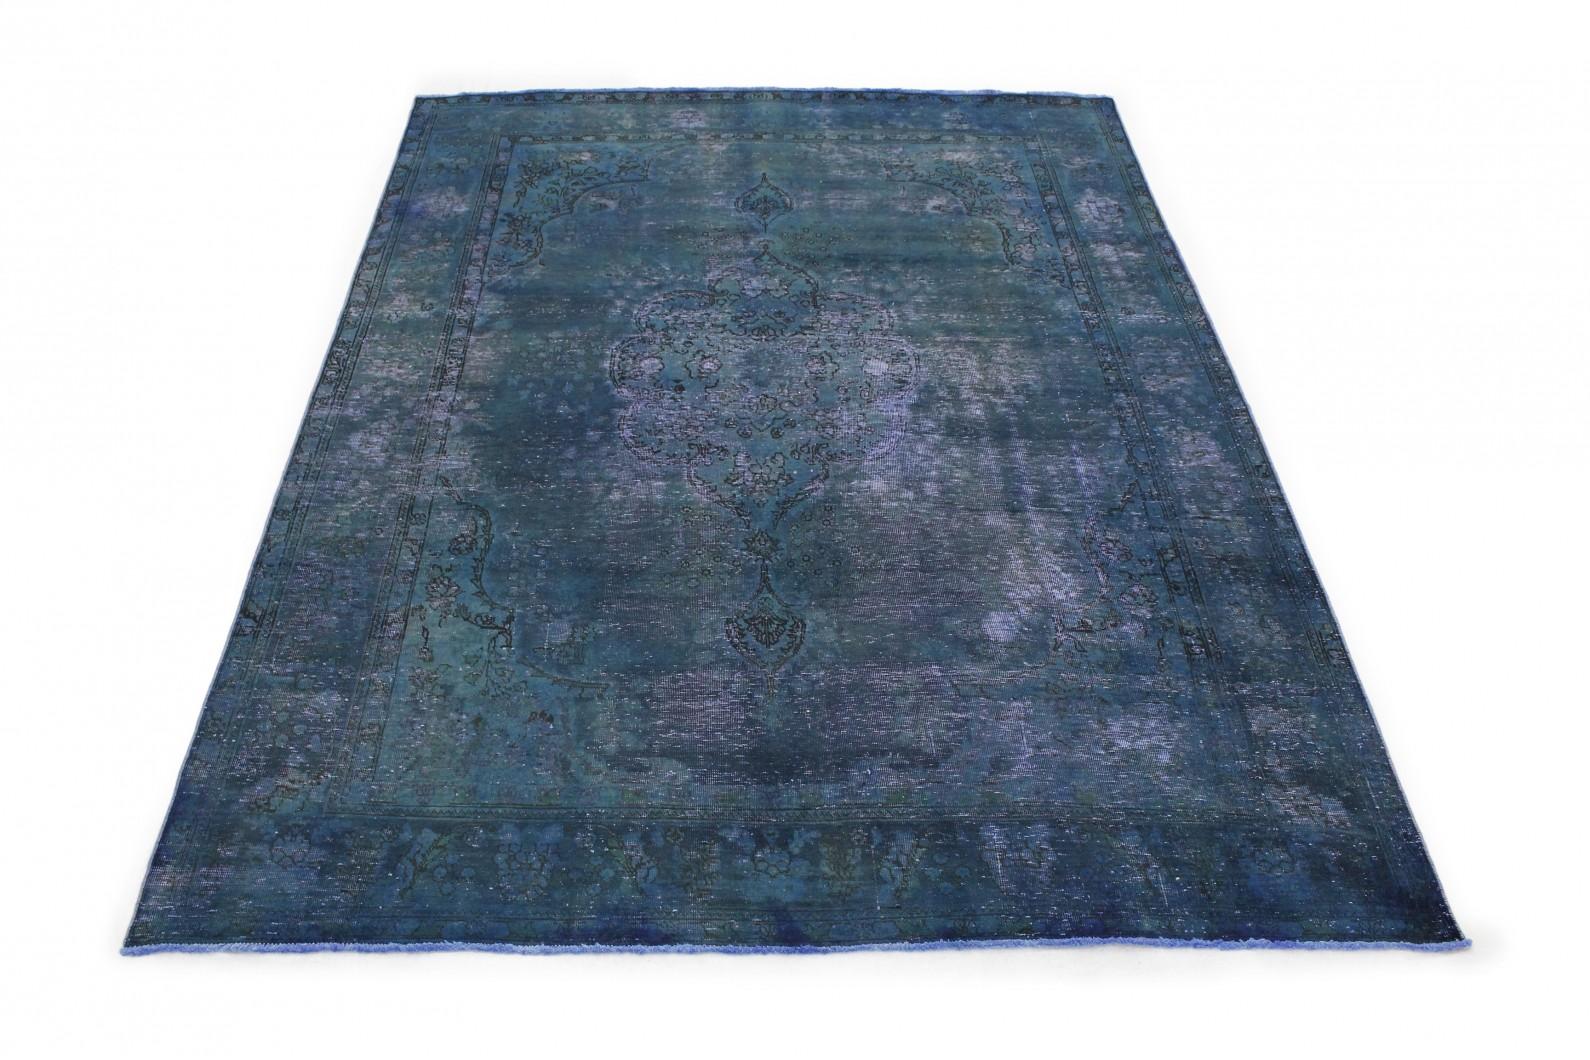 vintage teppich blau in 340x250 1001 177251 bei. Black Bedroom Furniture Sets. Home Design Ideas